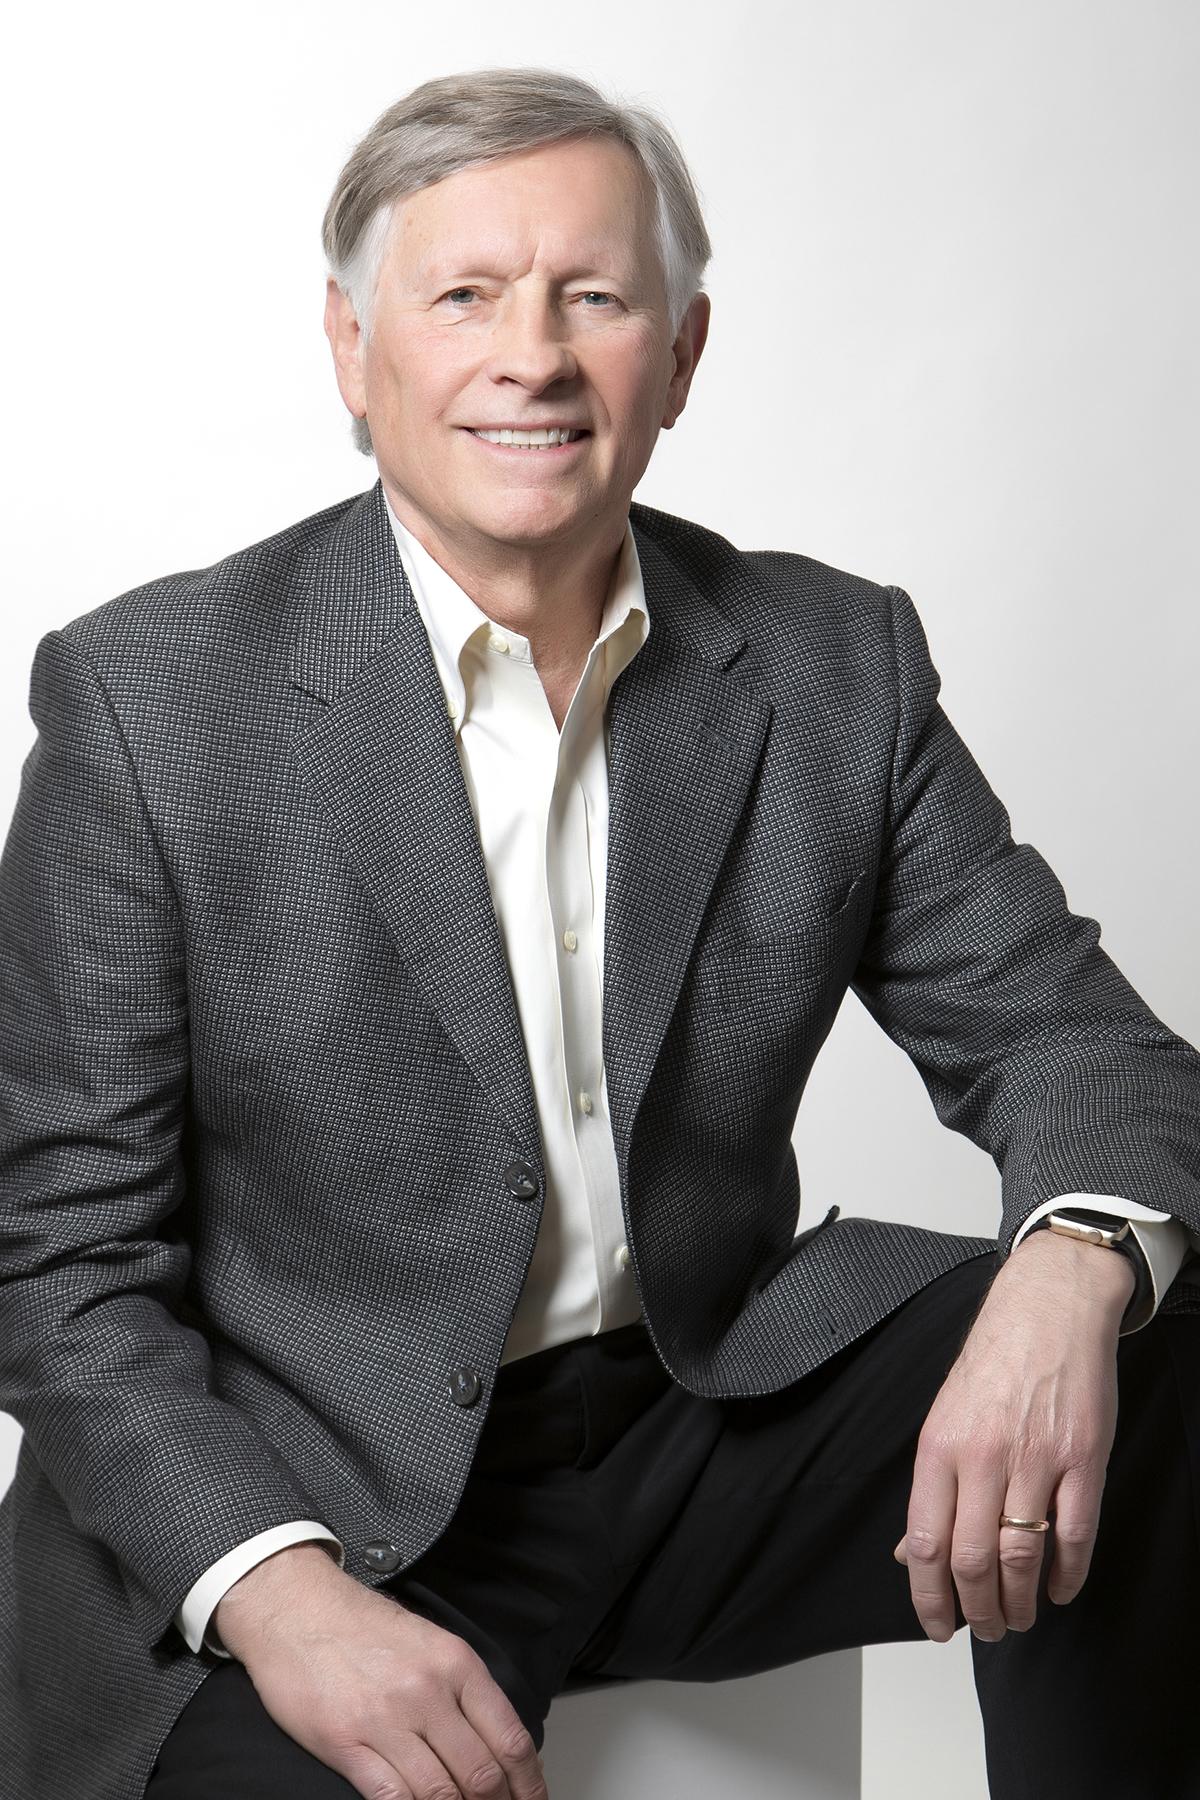 George S. Holzapfel